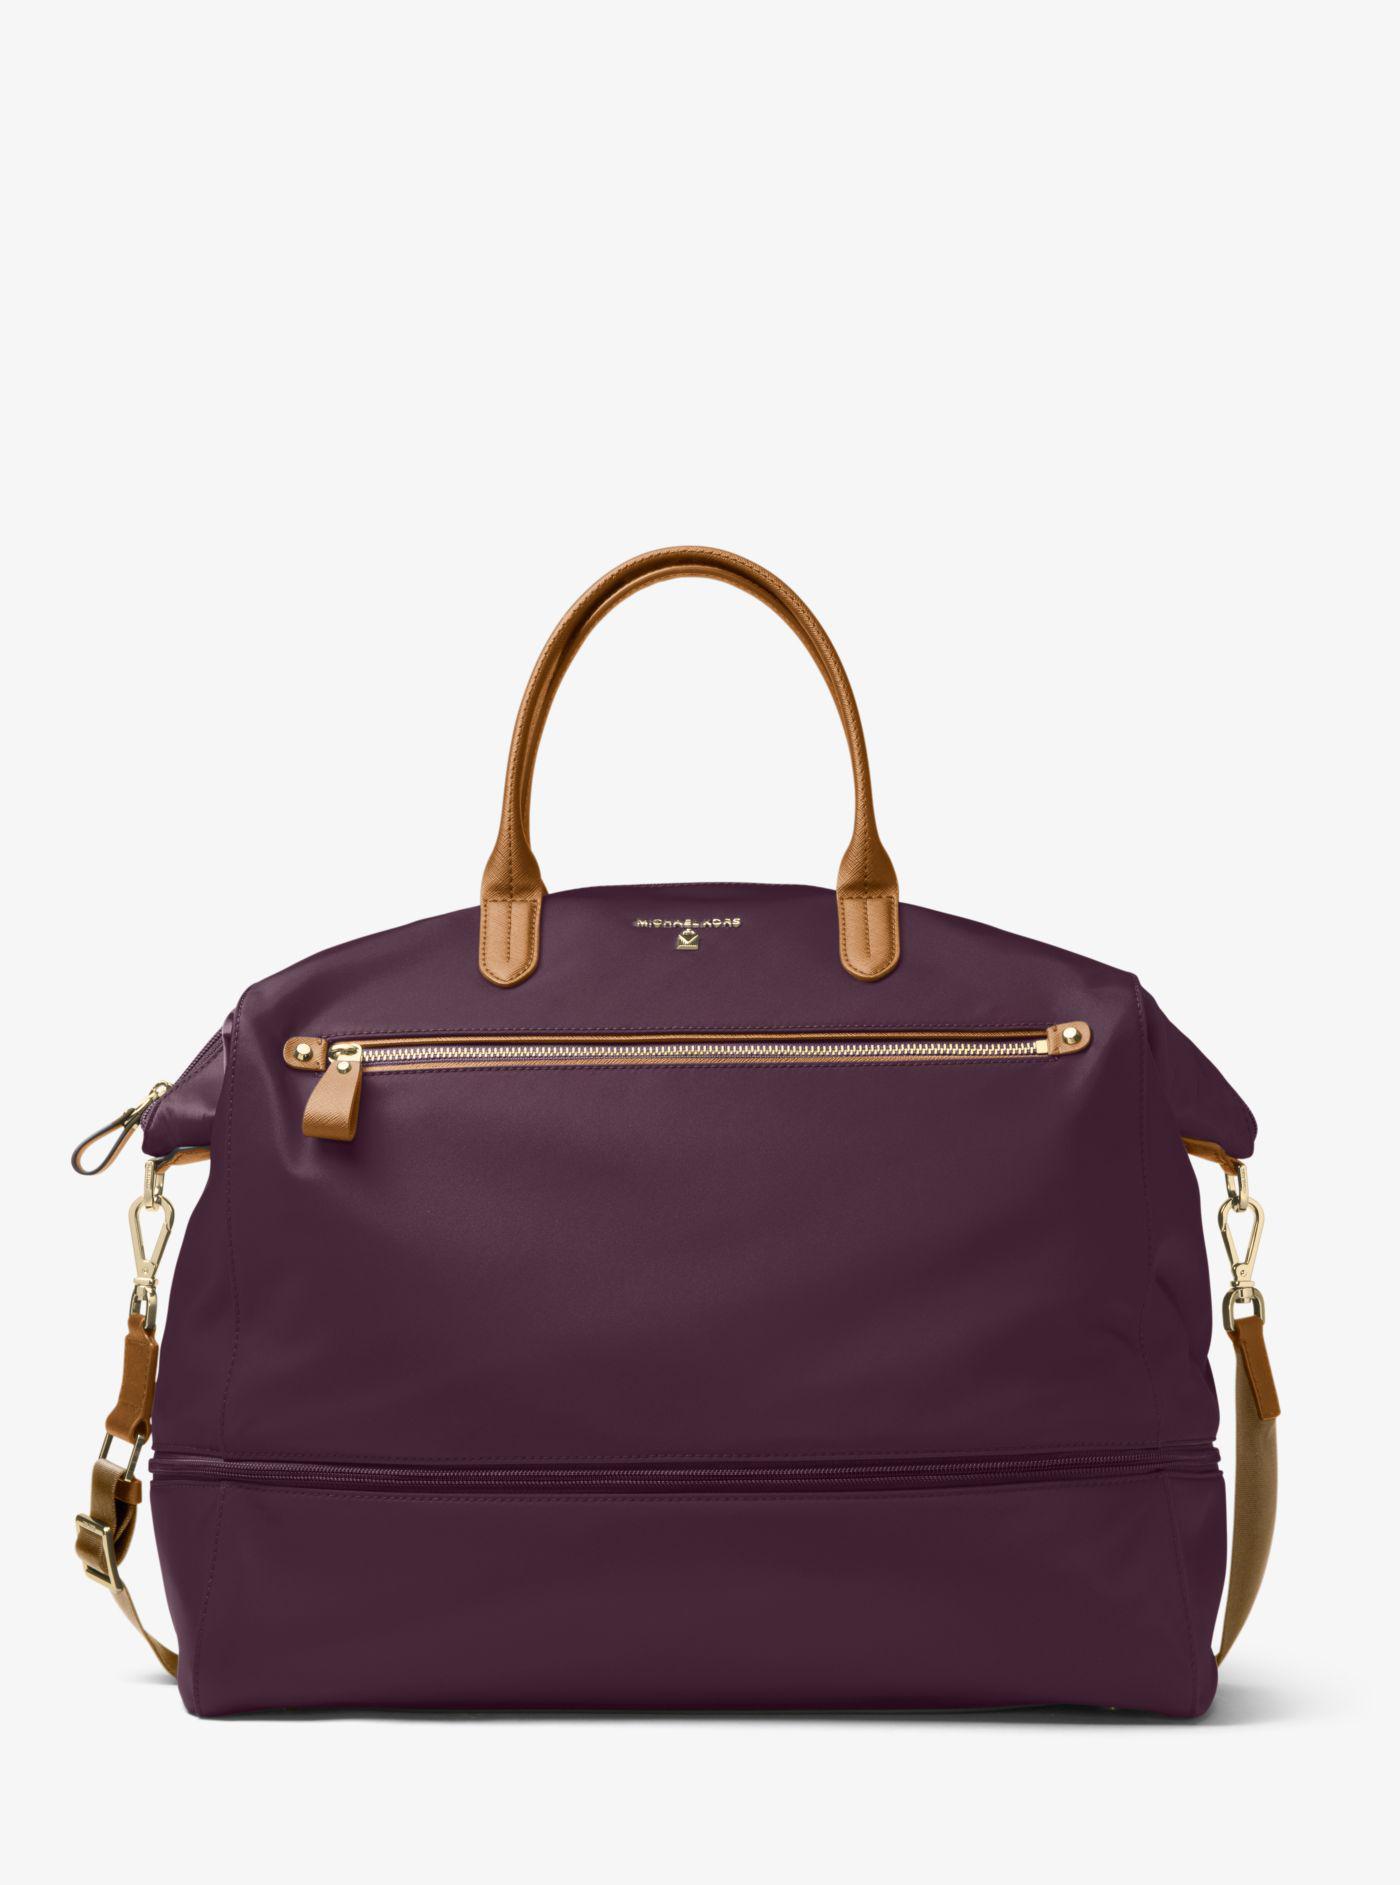 137fdf52df431c Michael Kors Kelsey Nylon Travel Tote in Purple - Lyst